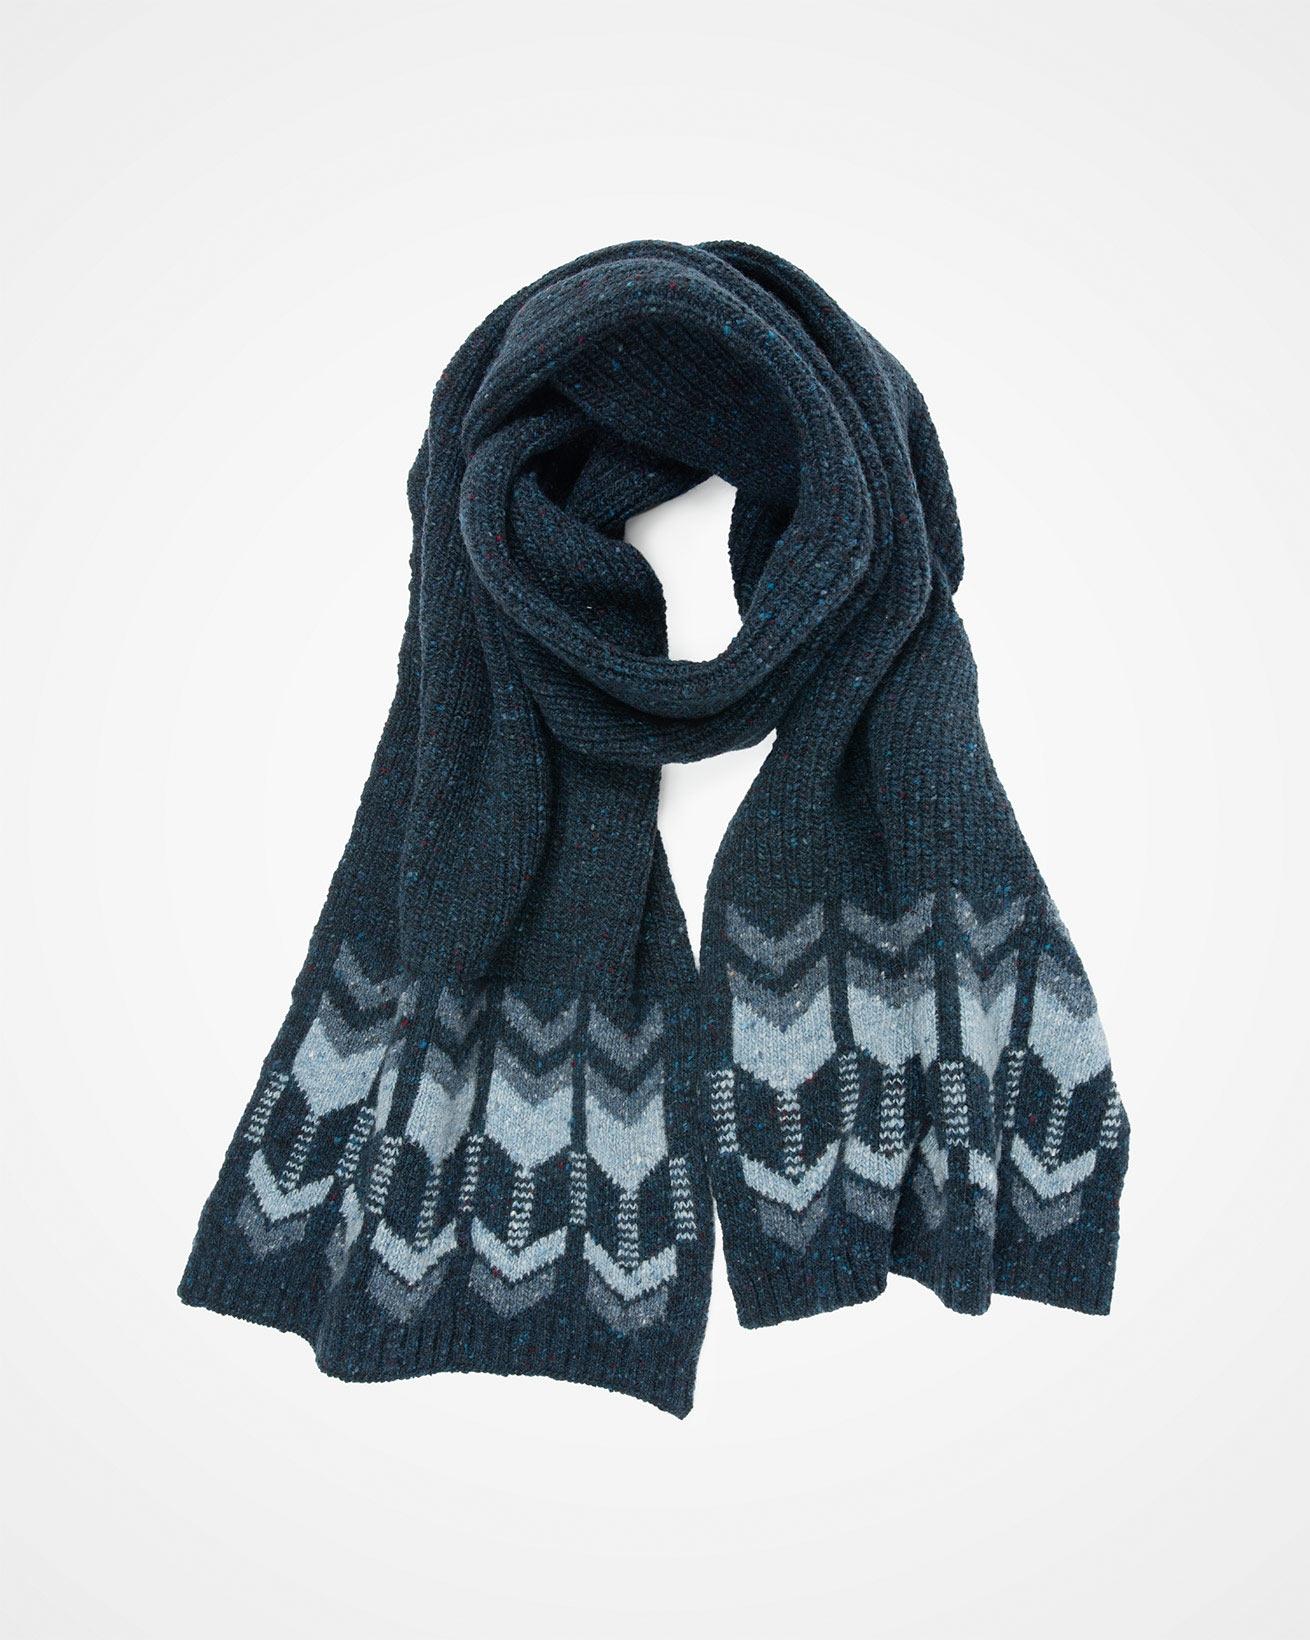 7755_donegal-rib-scarf_navy_swirl.jpg